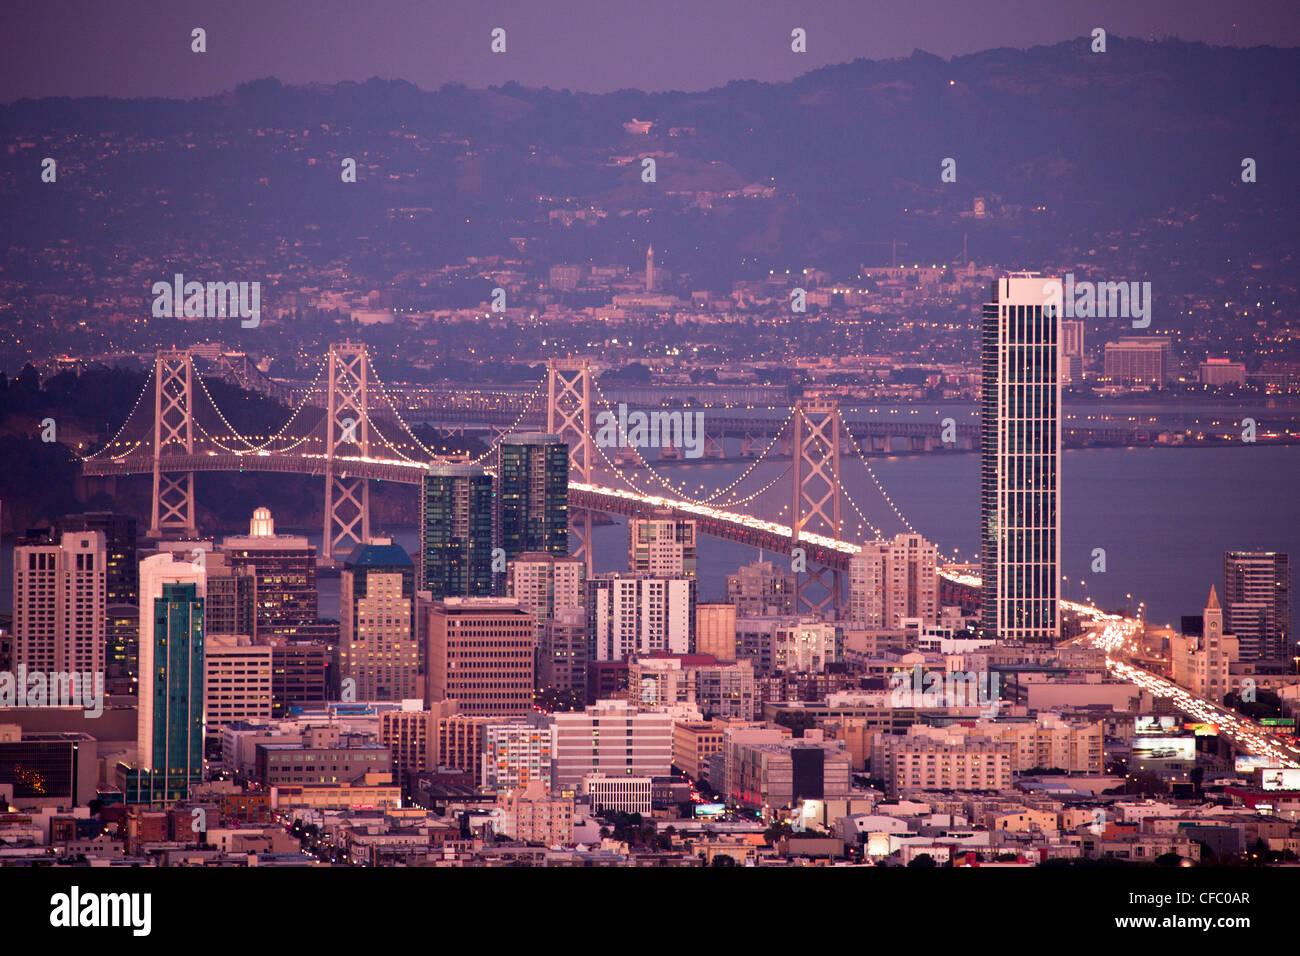 USA, USA, Amerika, Kalifornien, San Francisco, Stadt, Innenstadt, Bay Bridge, Architektur, Bay, downtown, berühmt, Stockbild